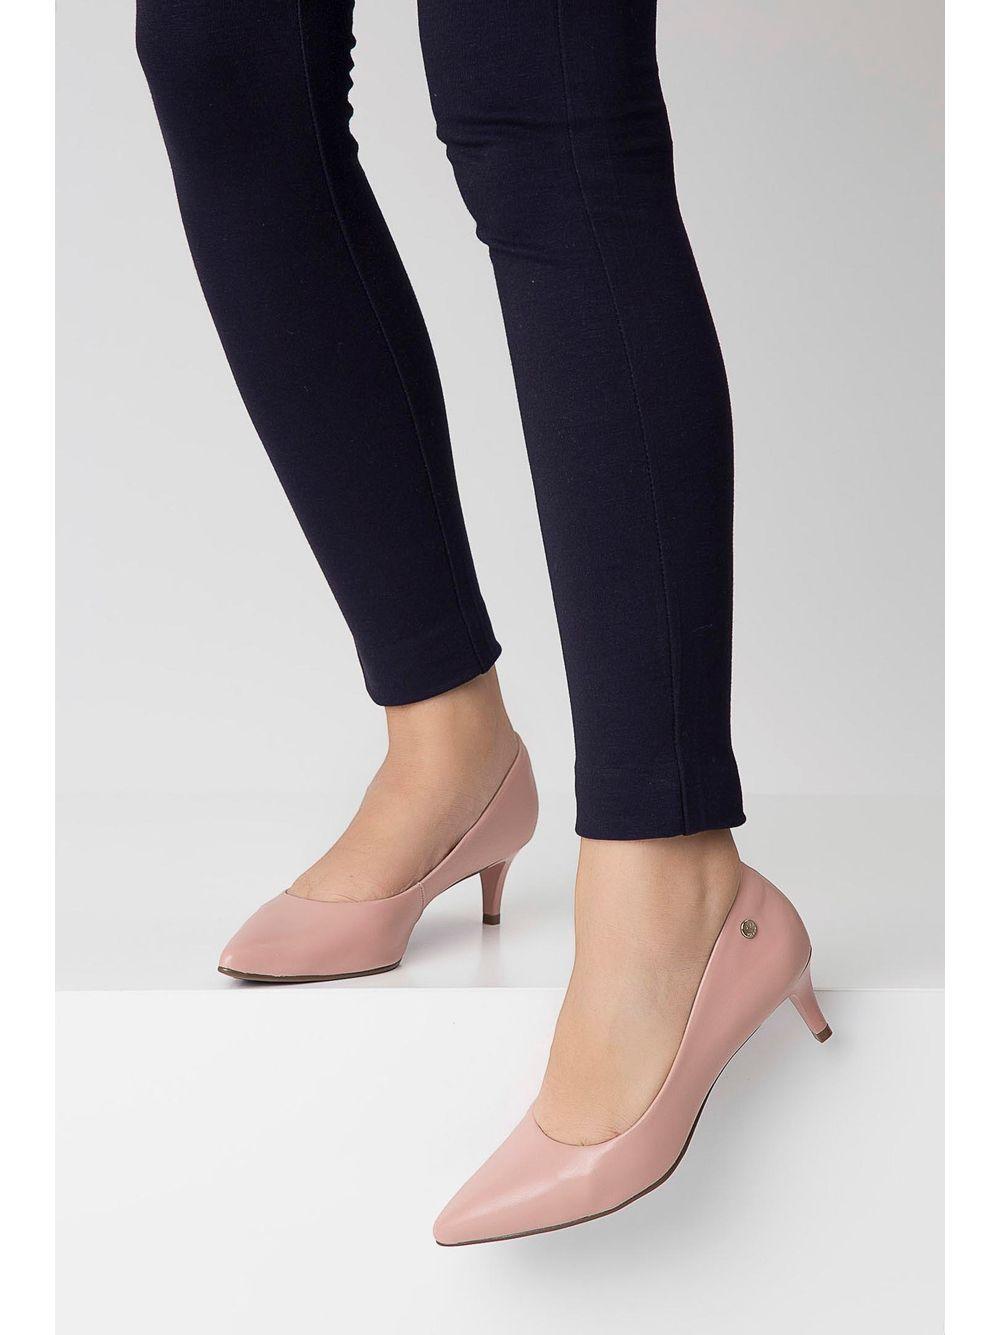 355e87533 Sapato Via Uno Scarpin Salto Baixo Rosa Claro - pittol